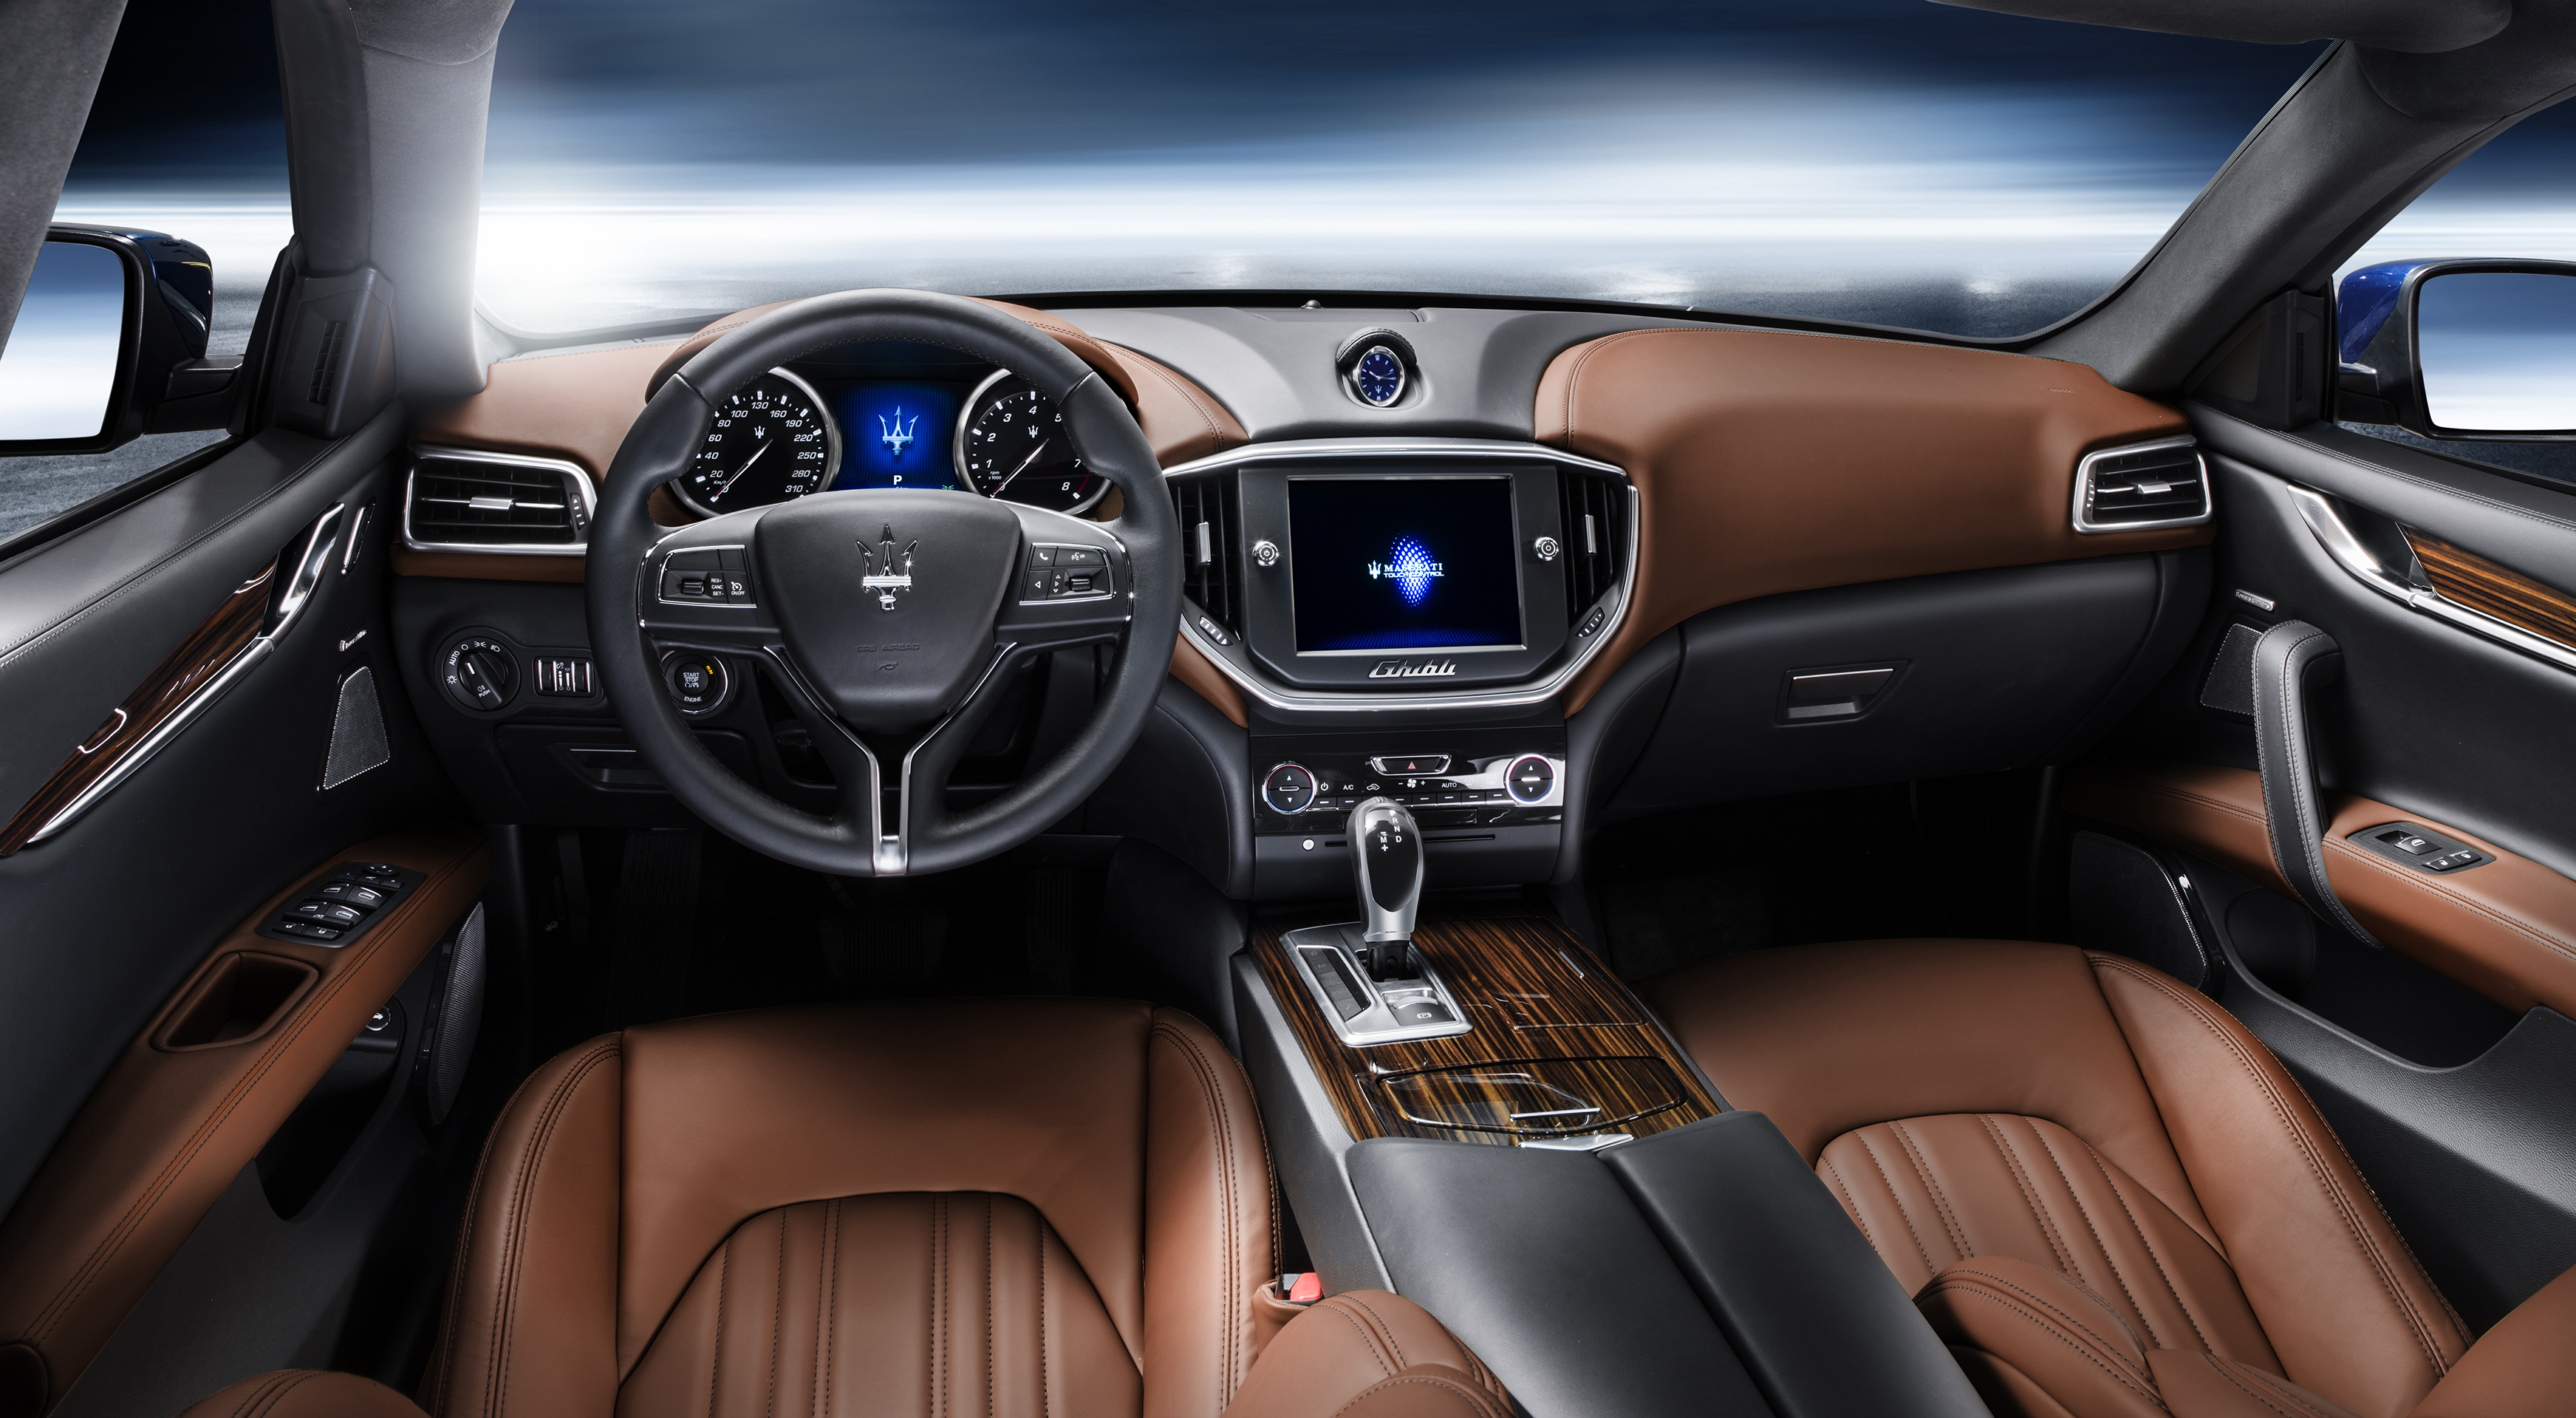 Maserati Ghibli Super Bowl Commercial Spurs Interest